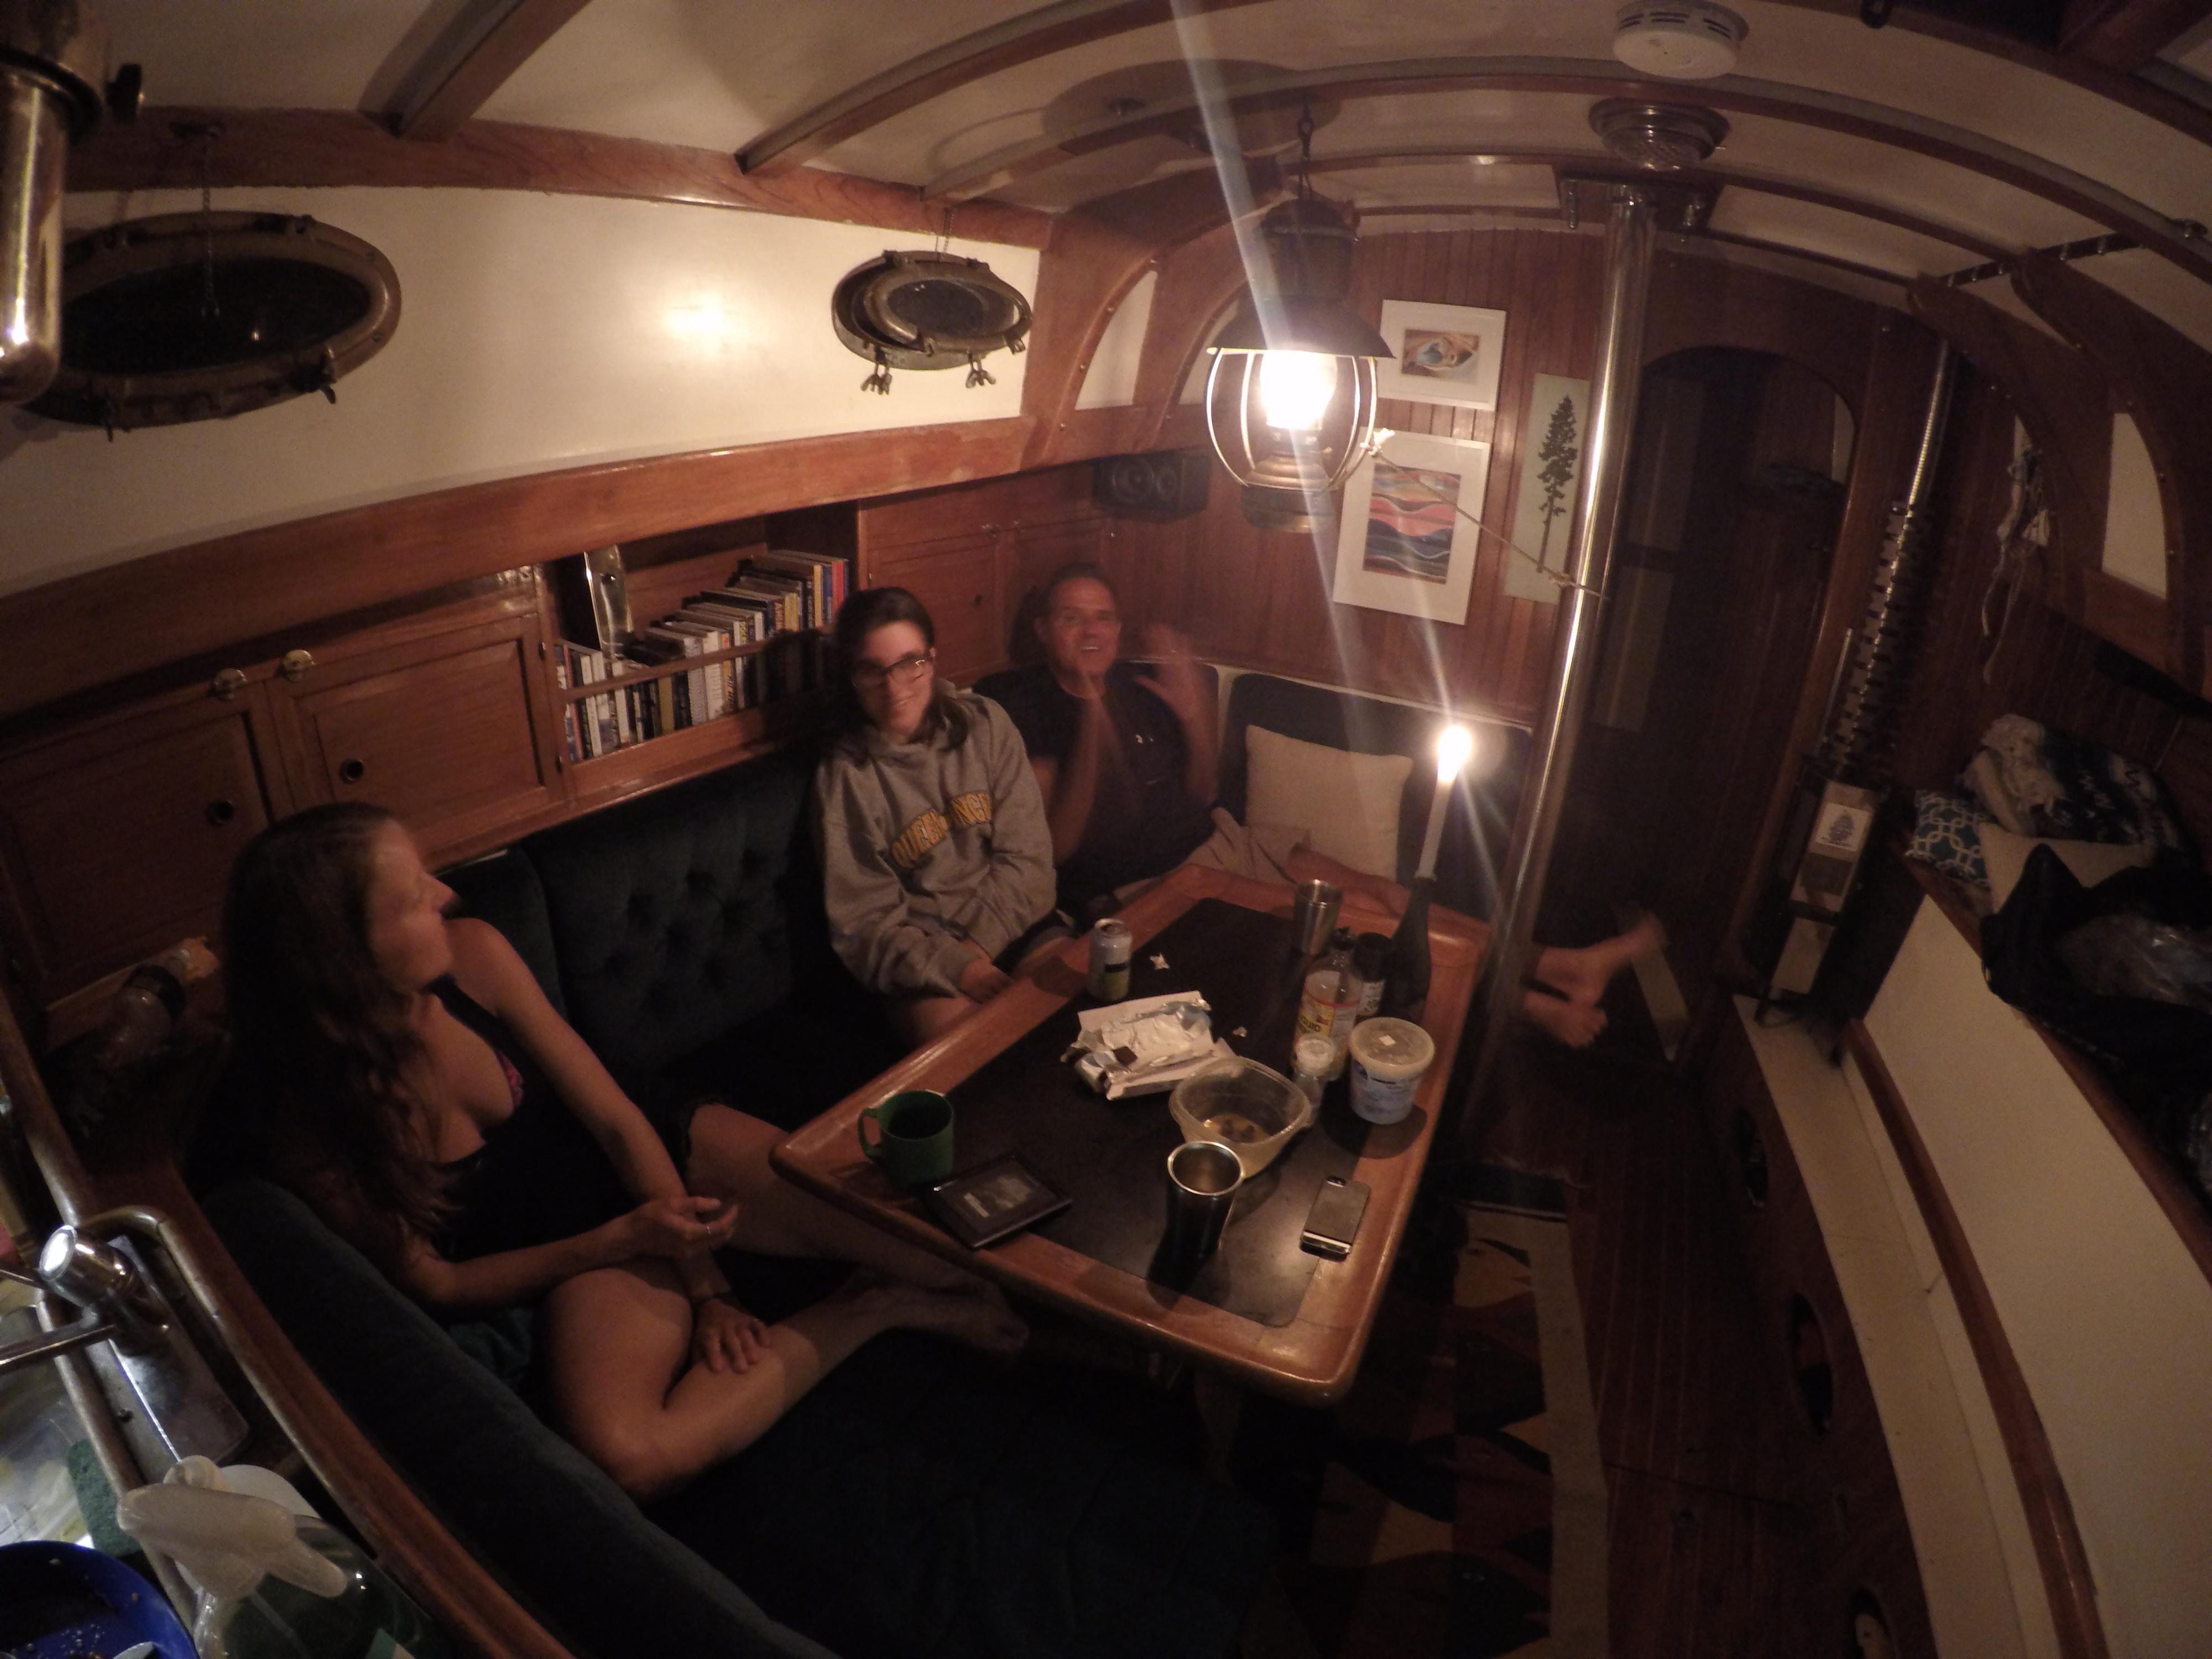 Saxony, Tamara and Roger aboard Leela at night